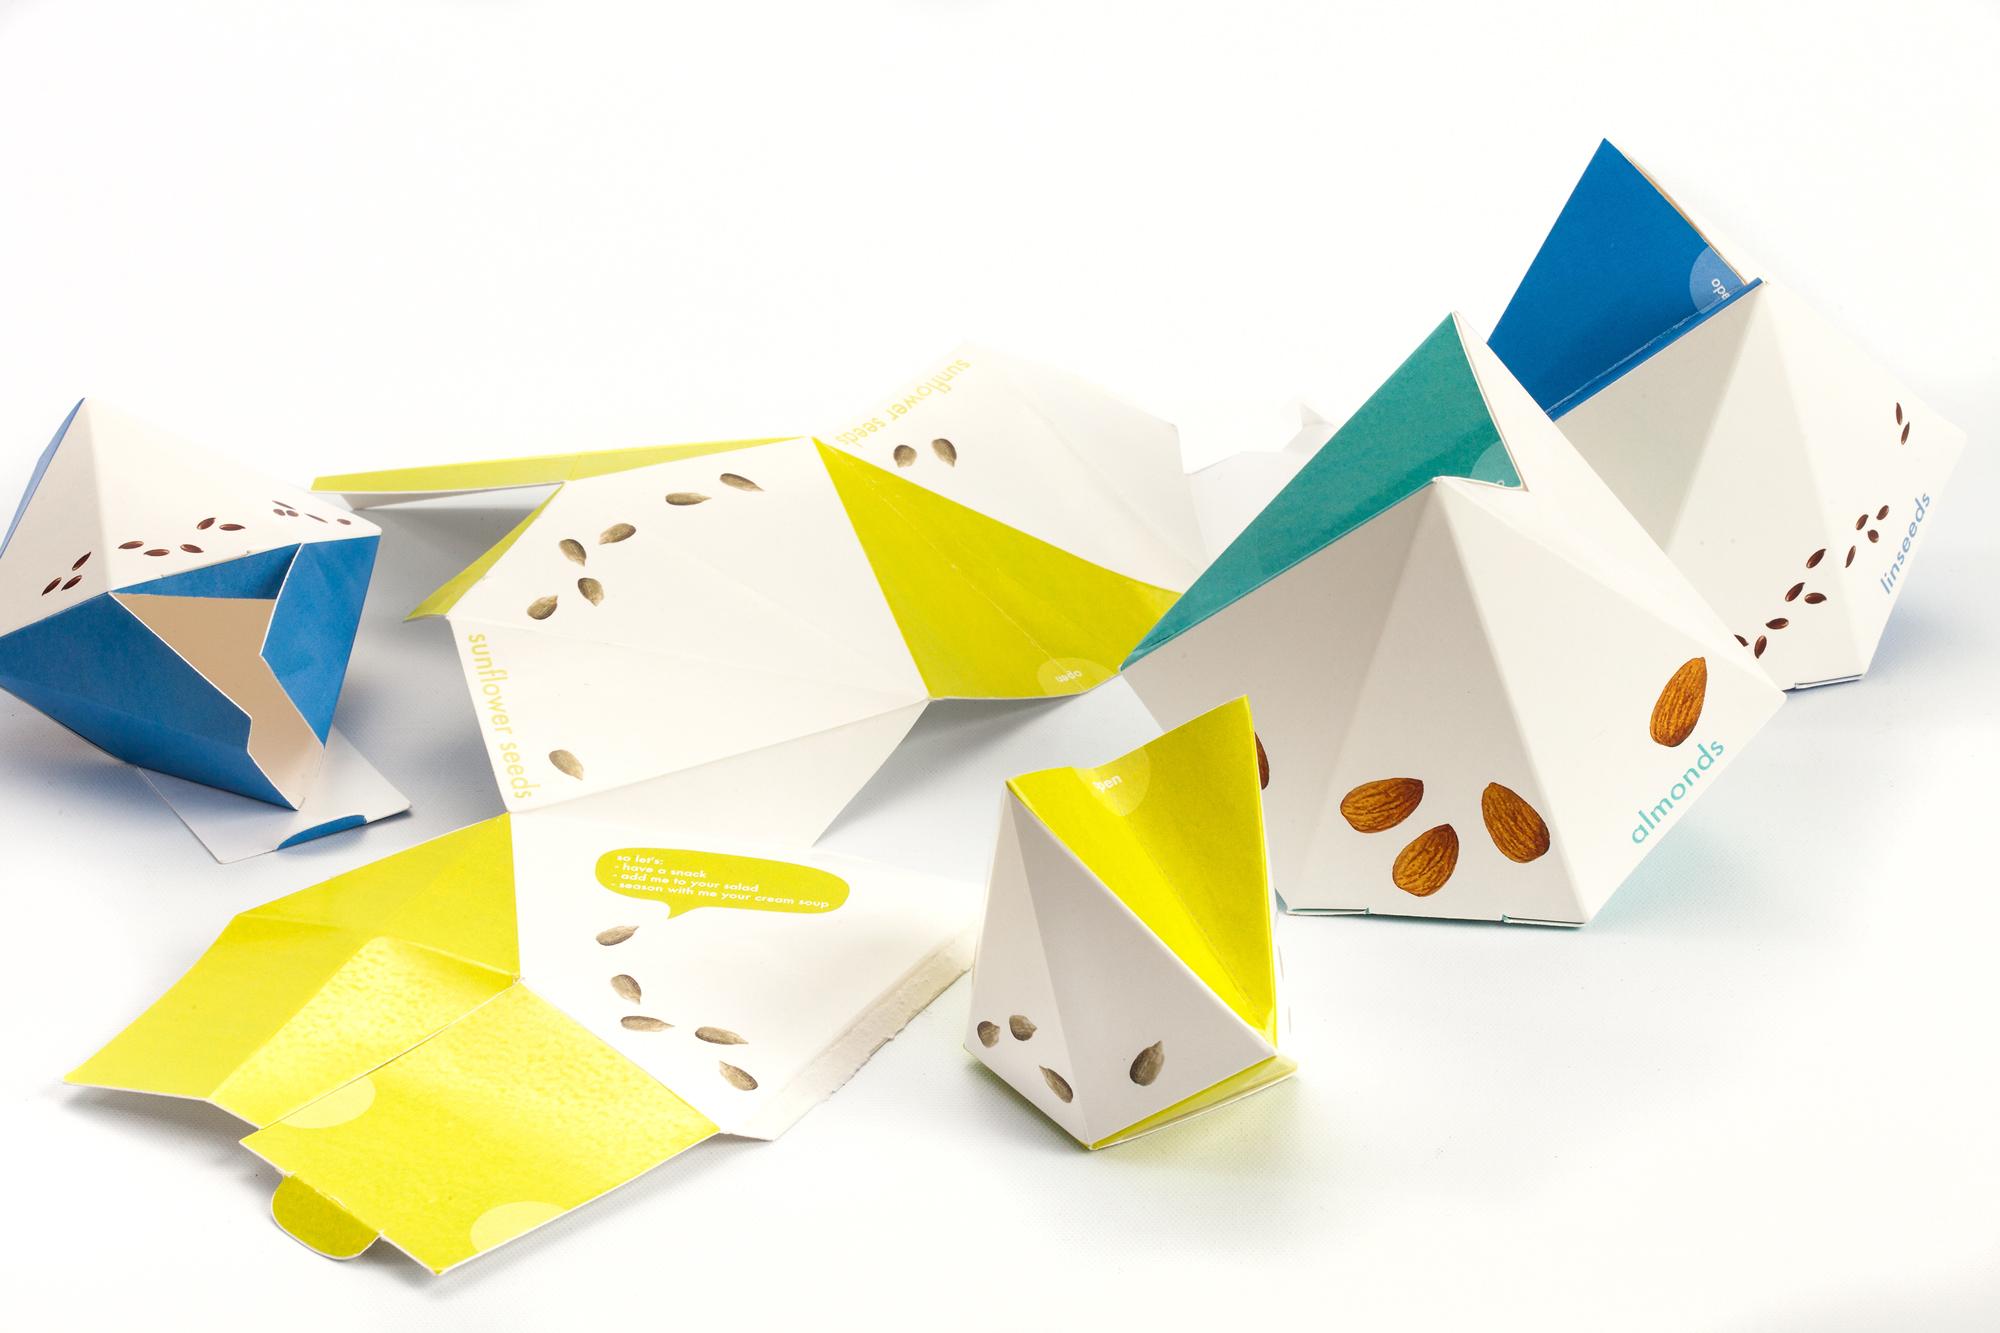 carton-award-image 129755